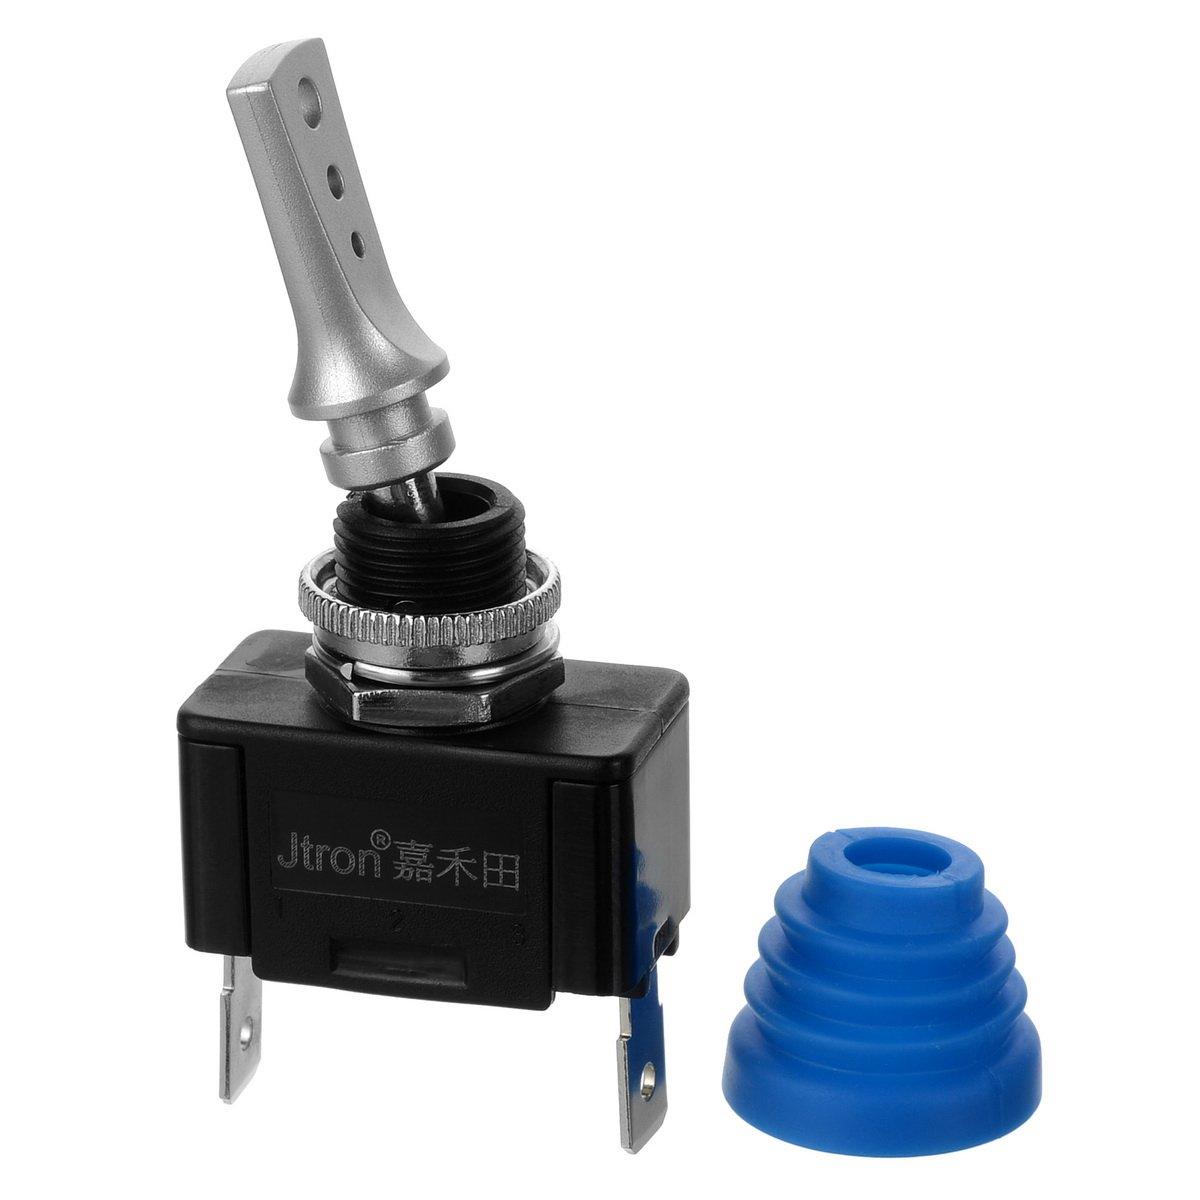 Jtron Waterproof Switch Toggle Rocker Spst Round All Electronics Corp Dc12v 40a 24v 20a On Off Automotive